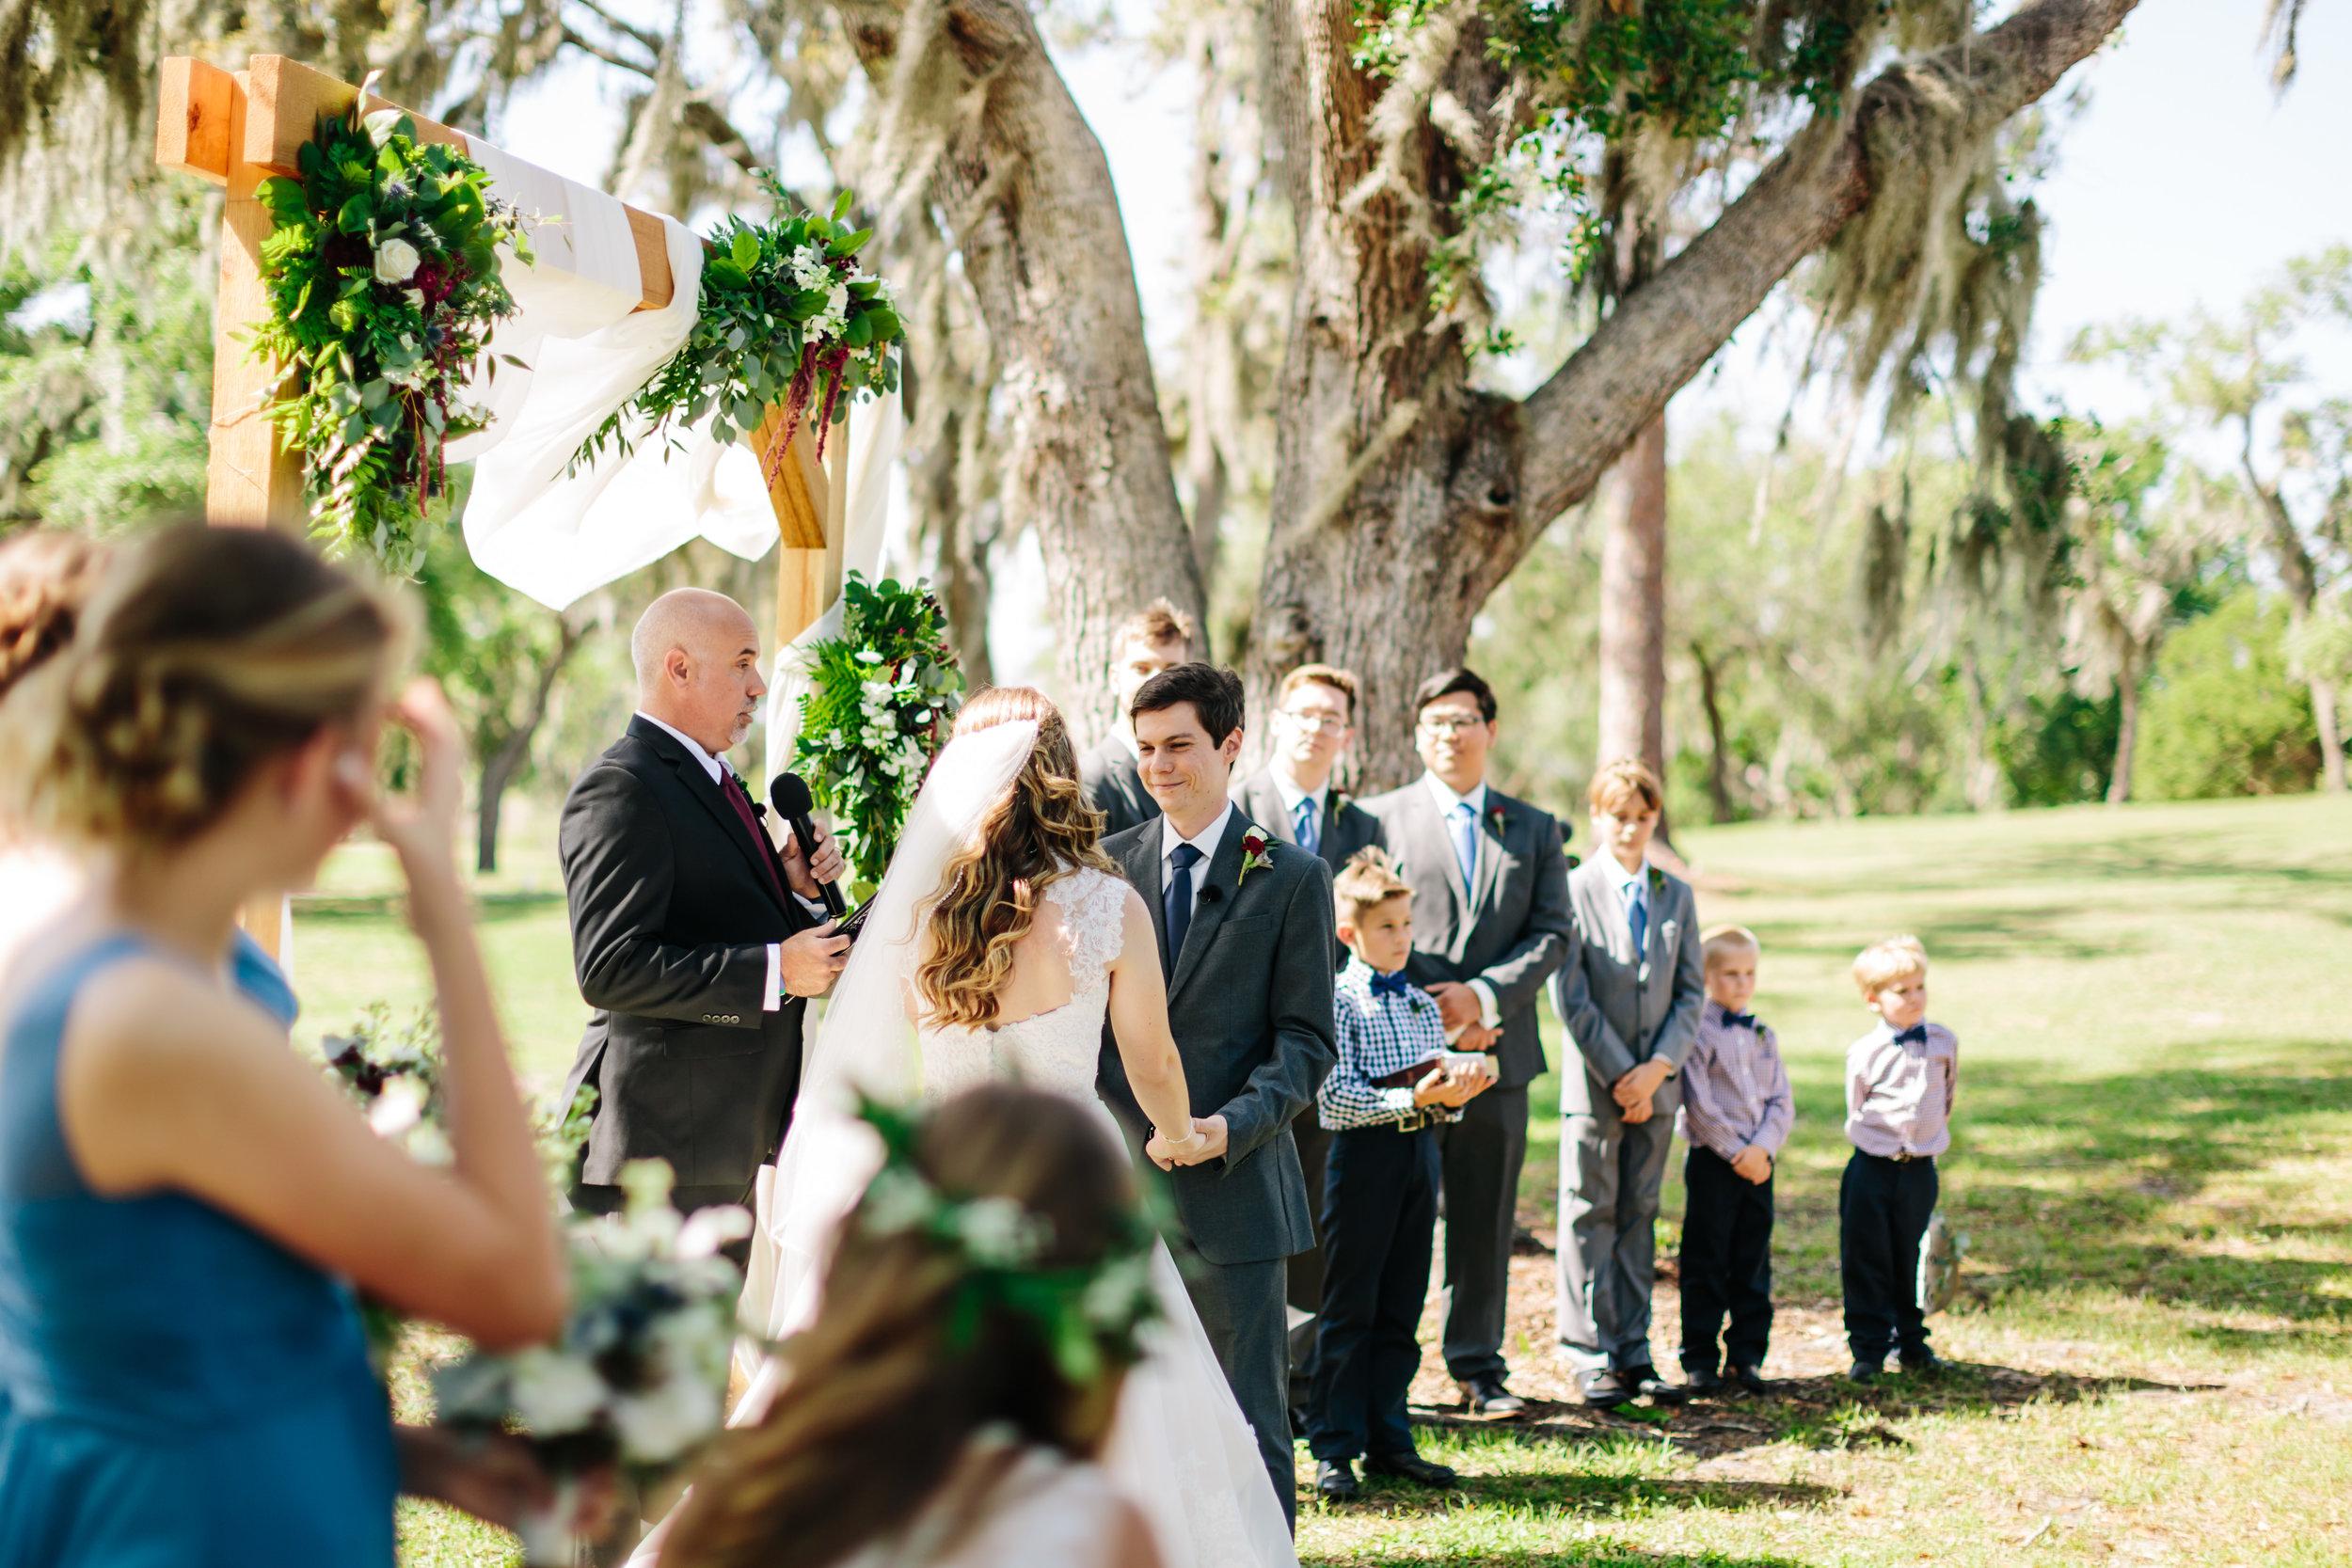 2018.04.14 Zak and Jamisyn Unrue Black Willow Barn Wedding Finals-360.jpg